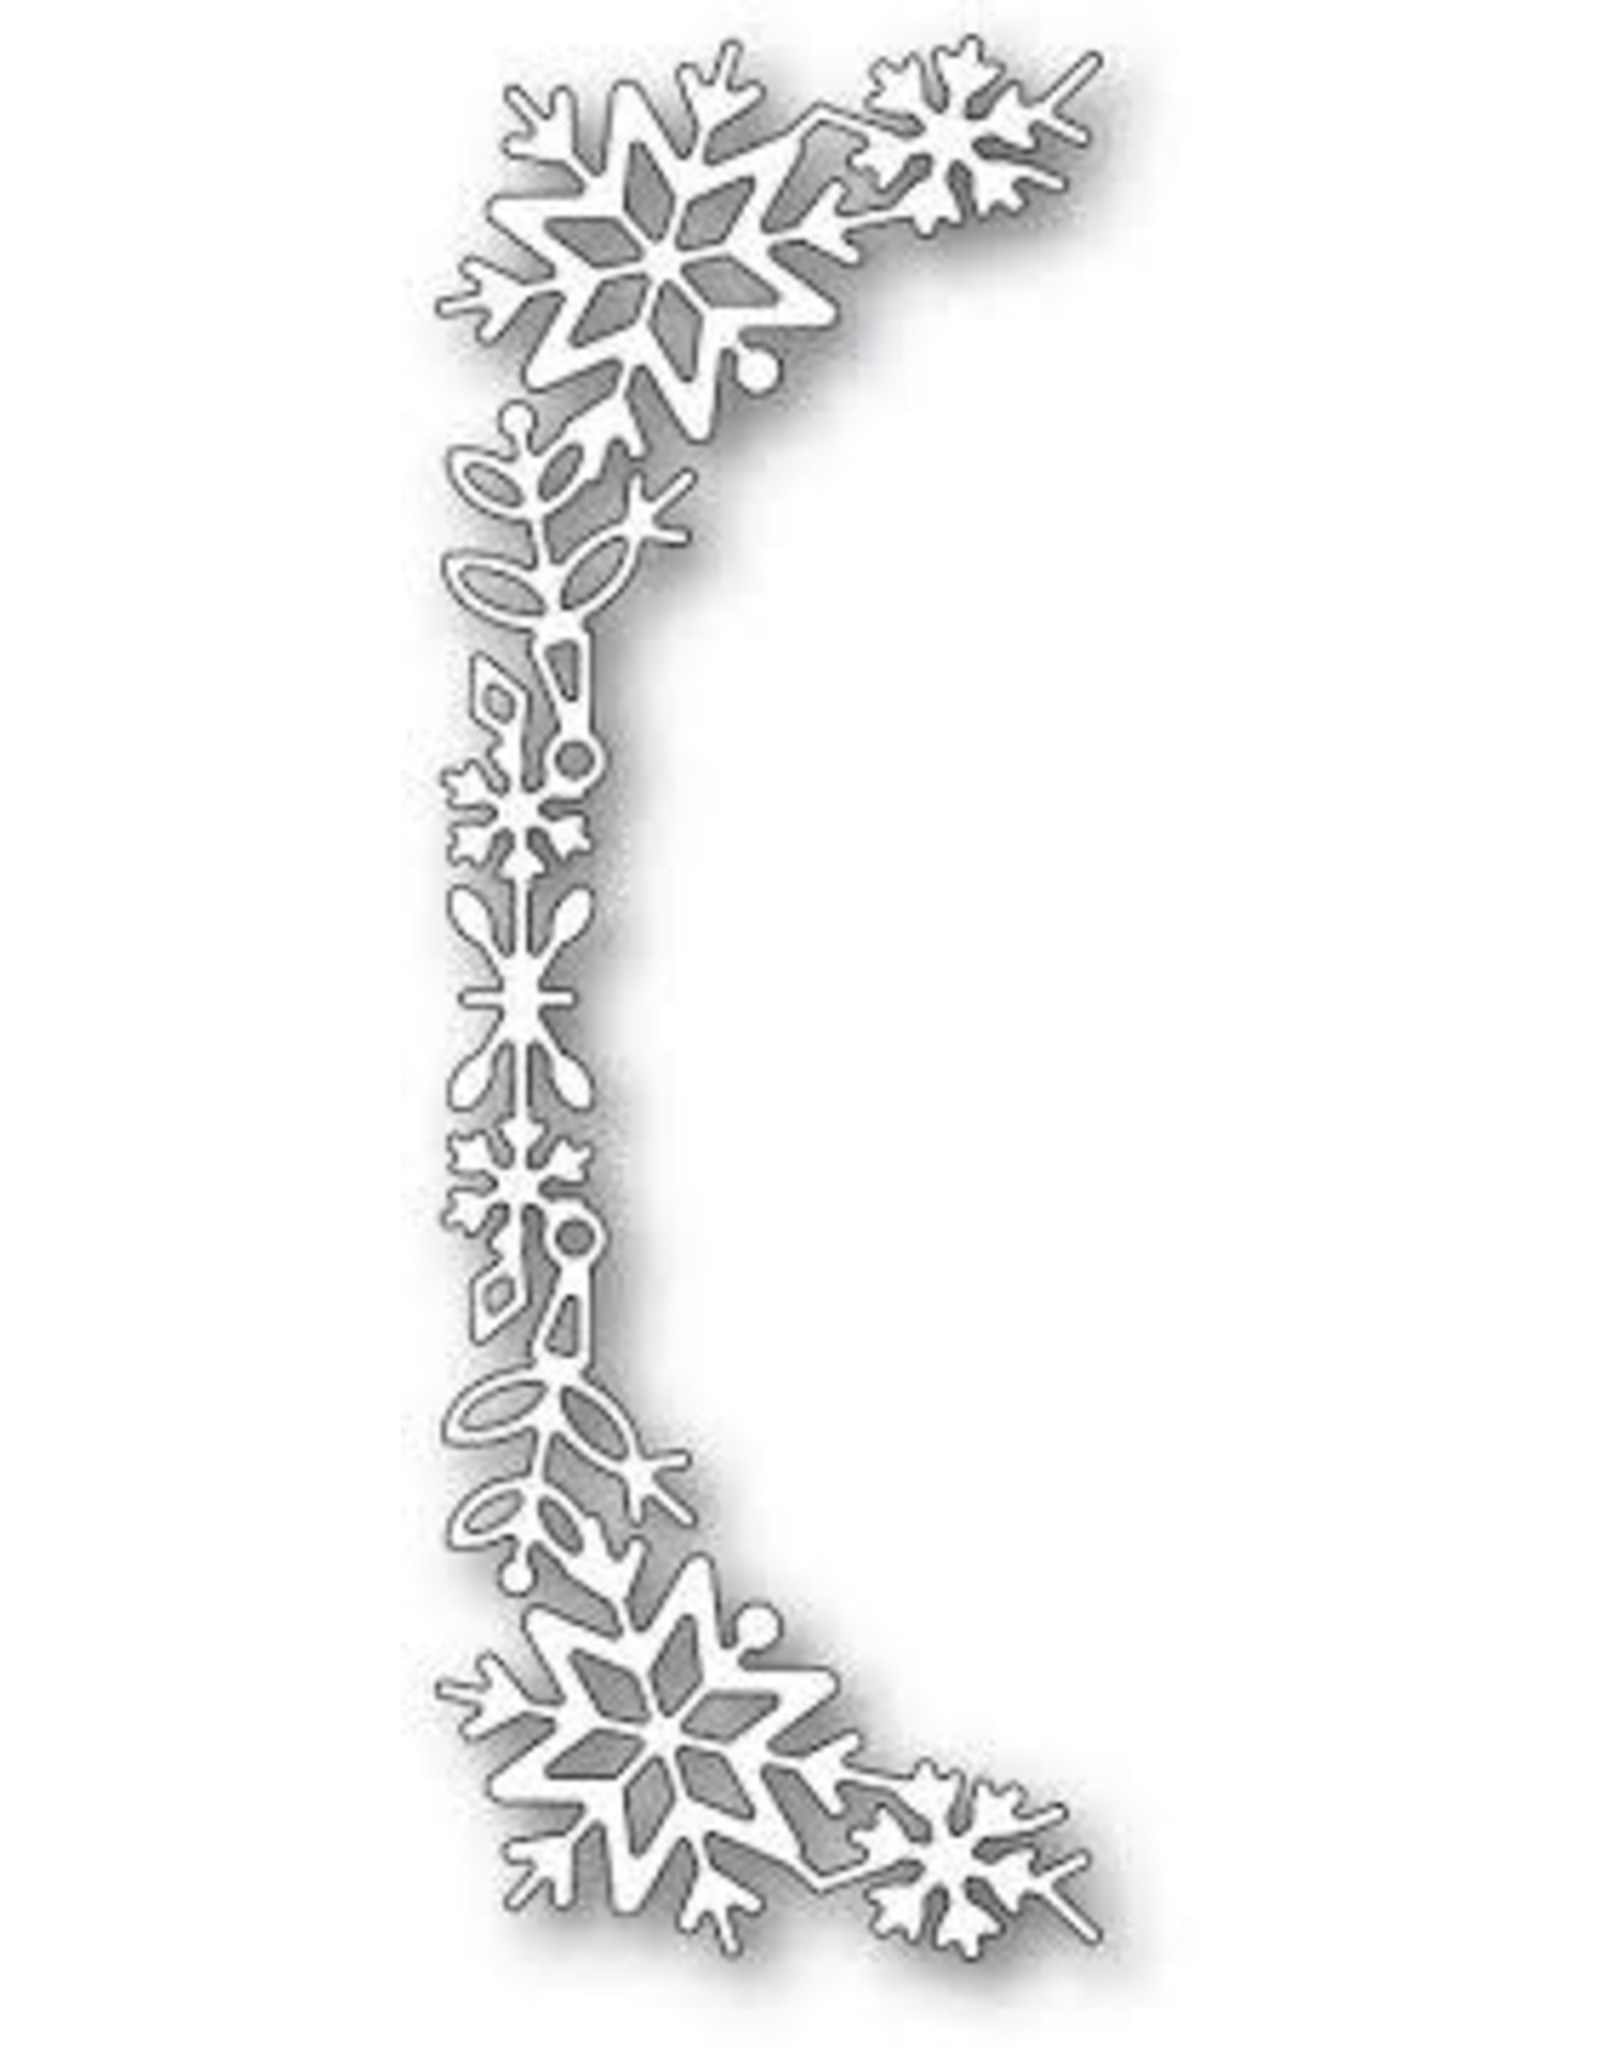 Poppystamps, Inc. Snowflake Tall Curve Border die